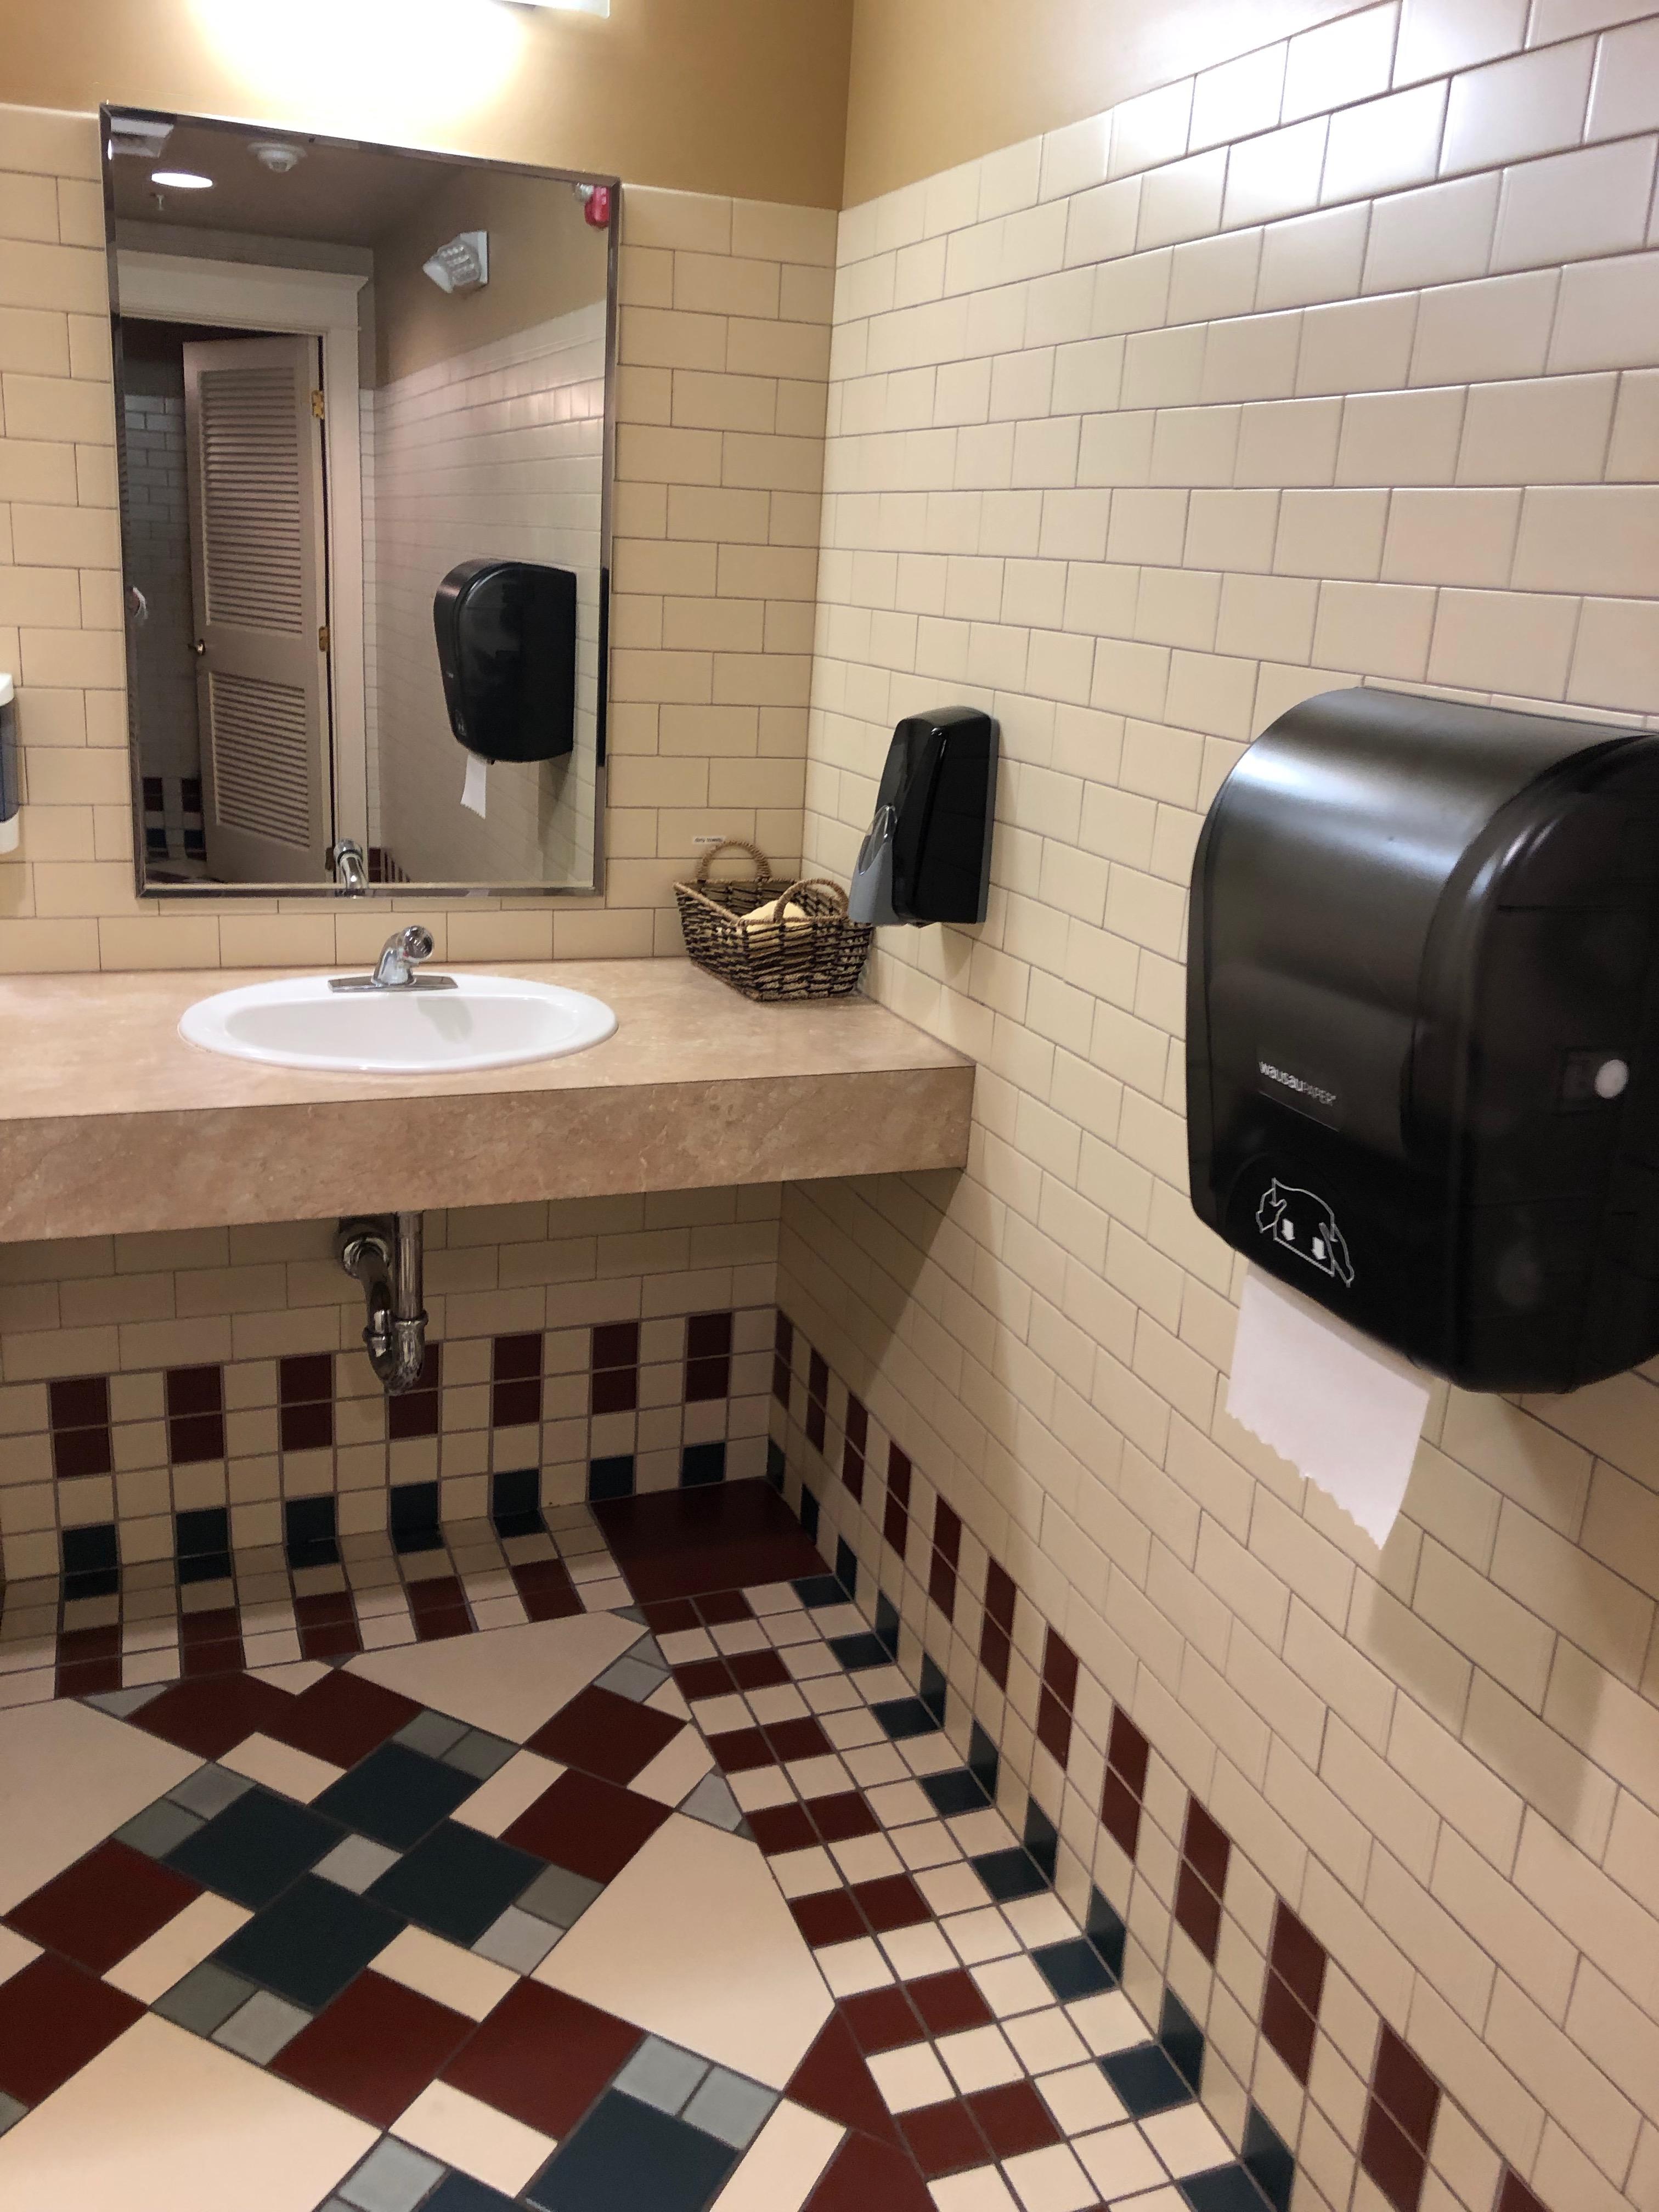 Sink in women's restroom